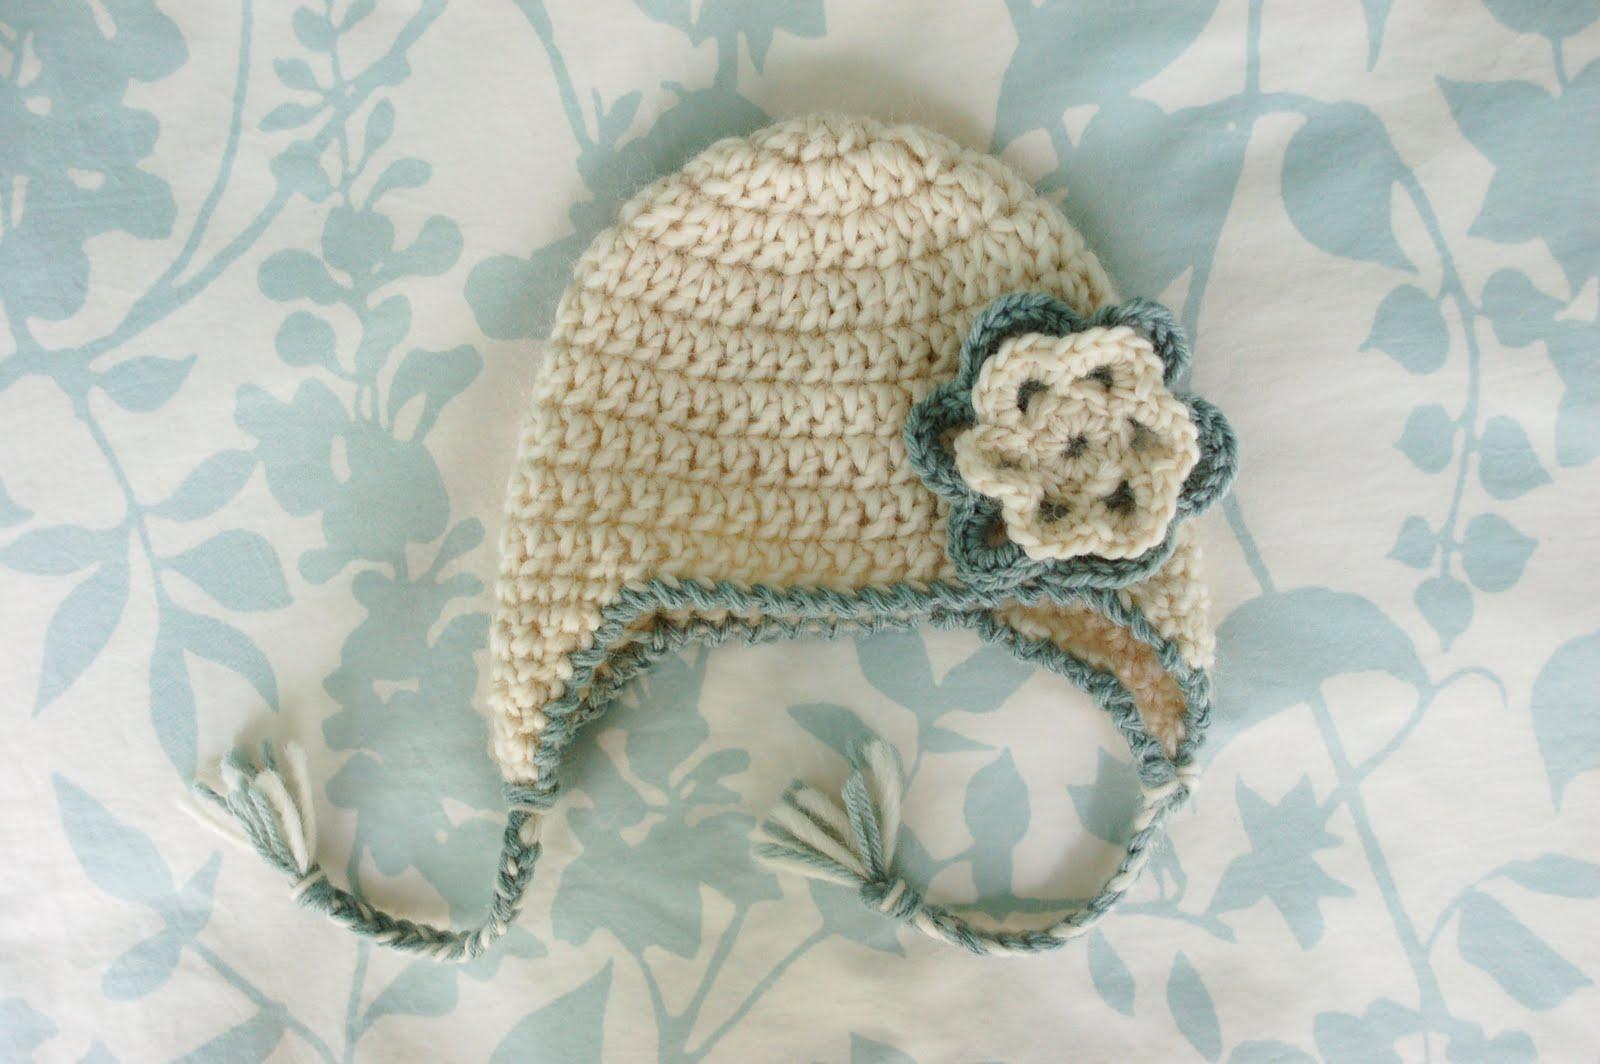 8d9221193e5 Alli Crafts  Free Pattern  Baby Earflap Hat - Newborn